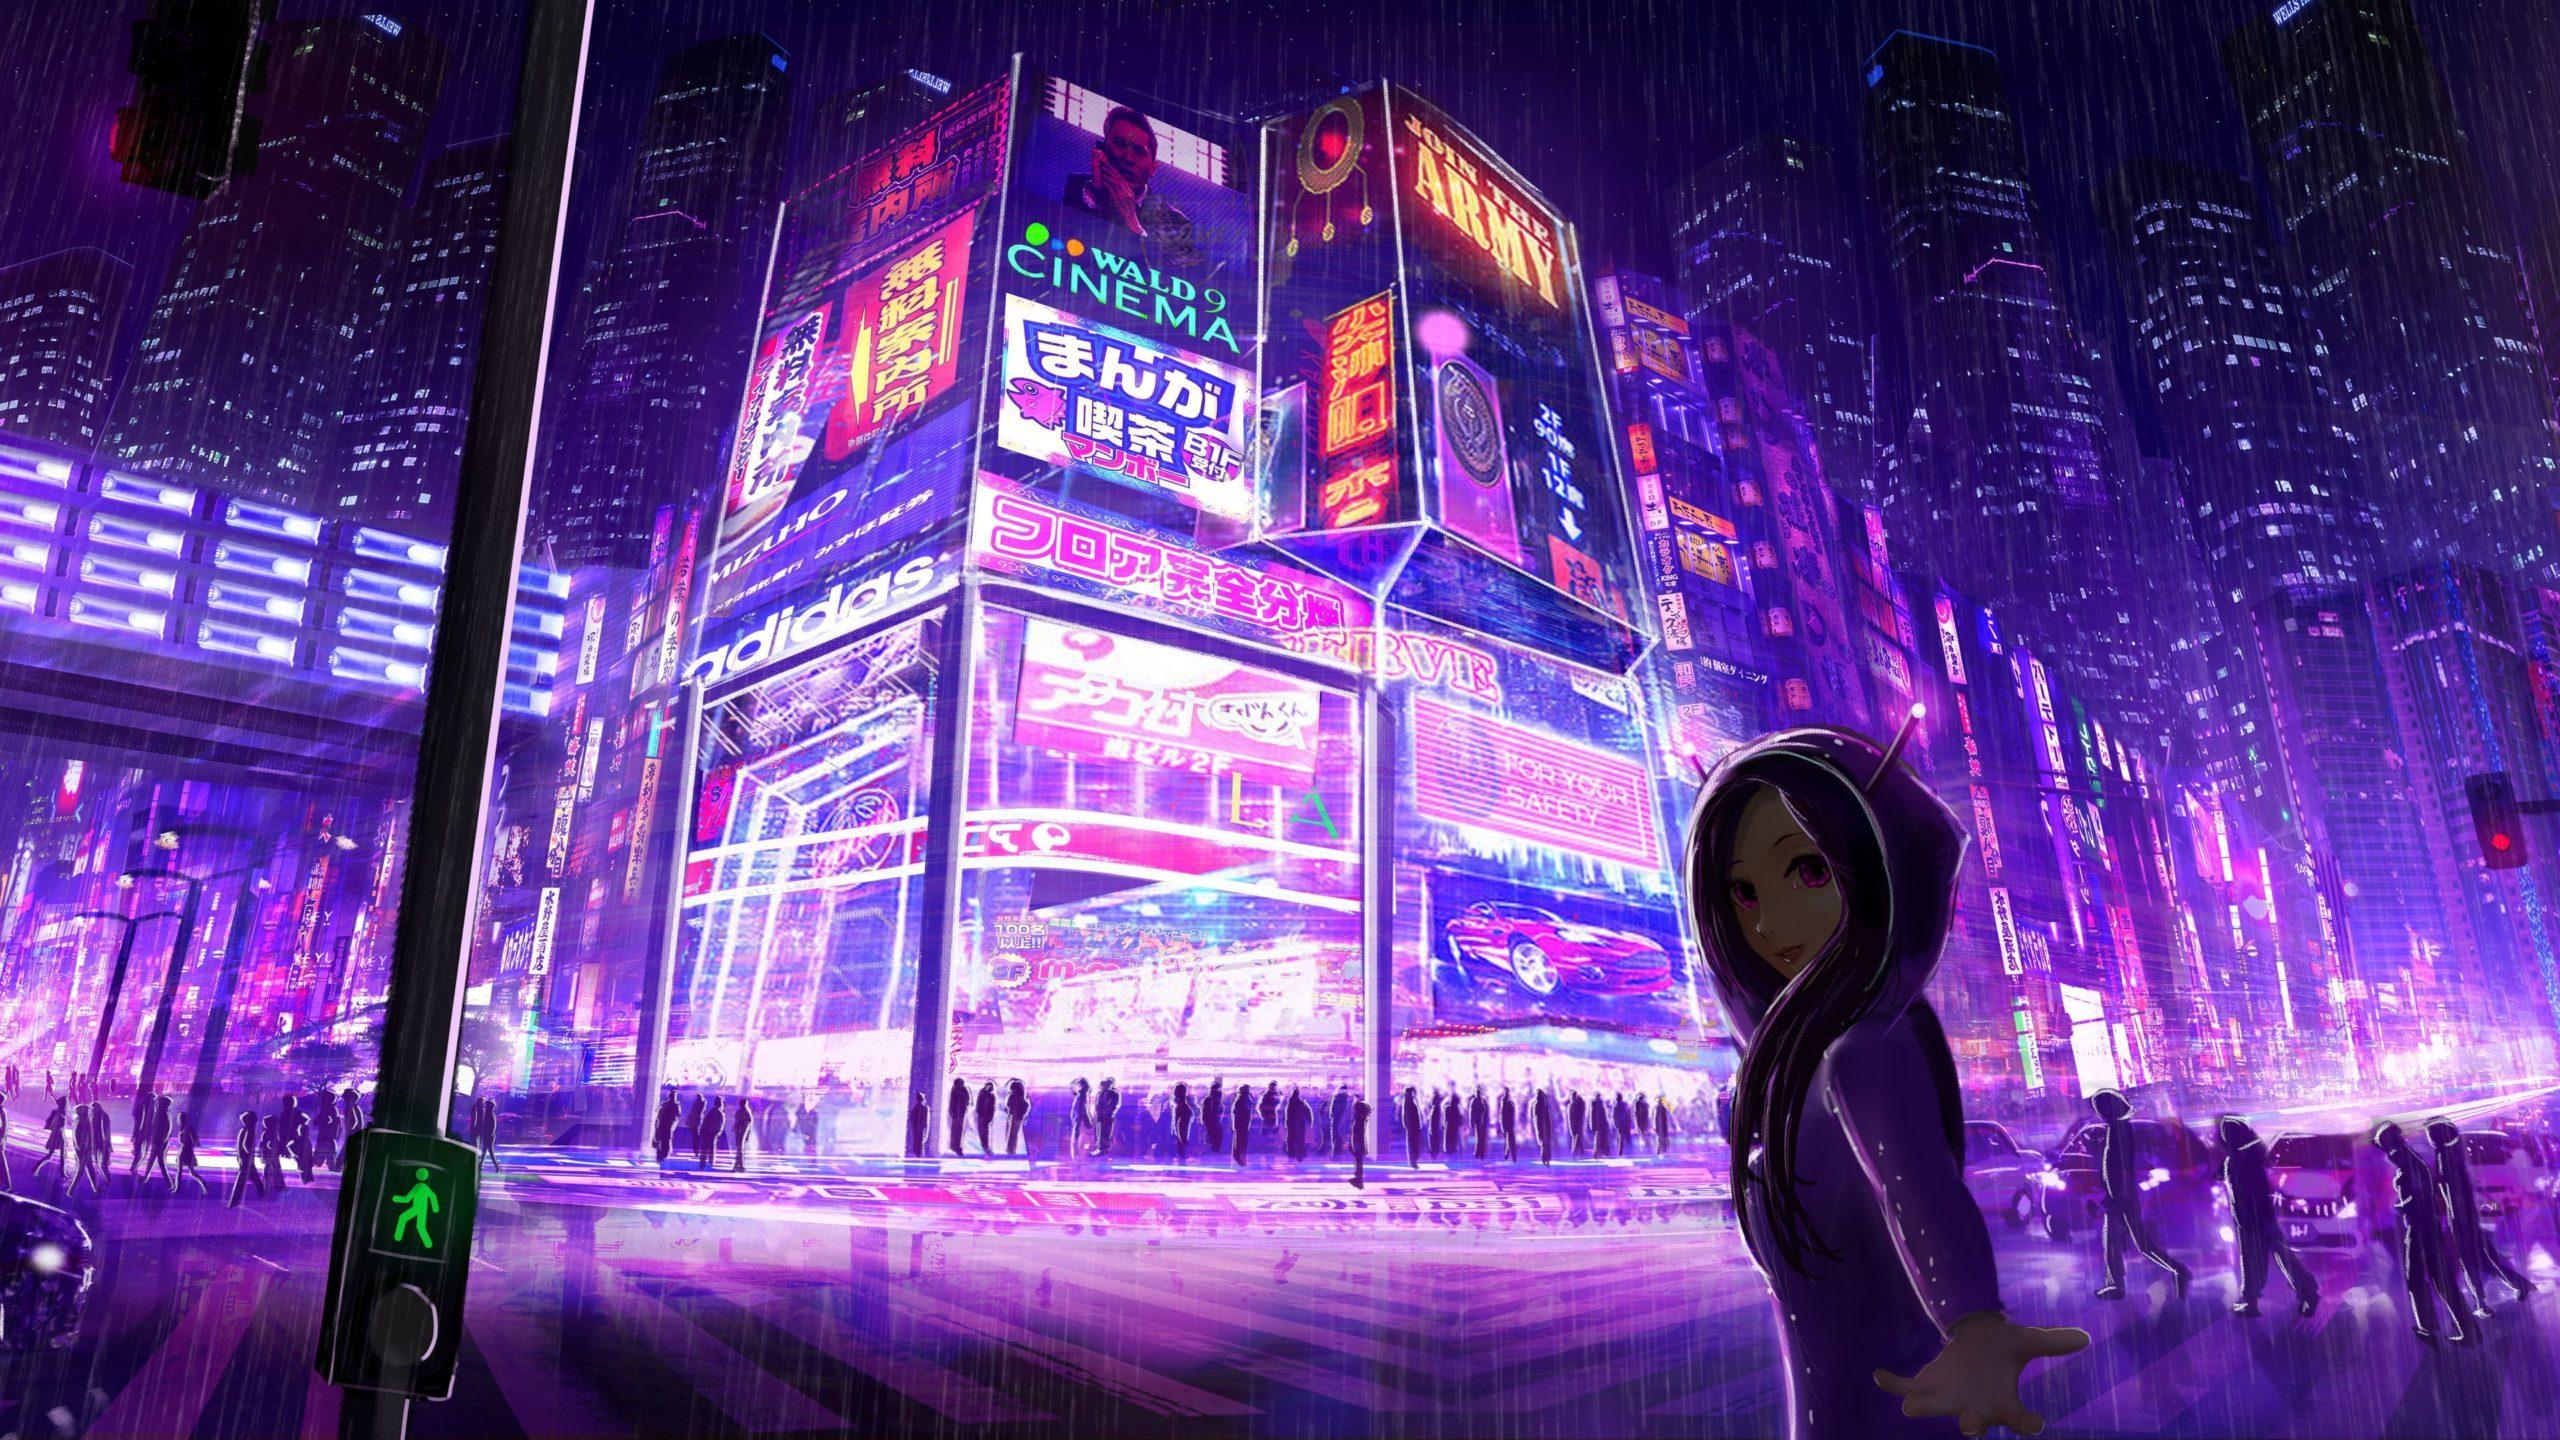 wallpaper cyberpunk free